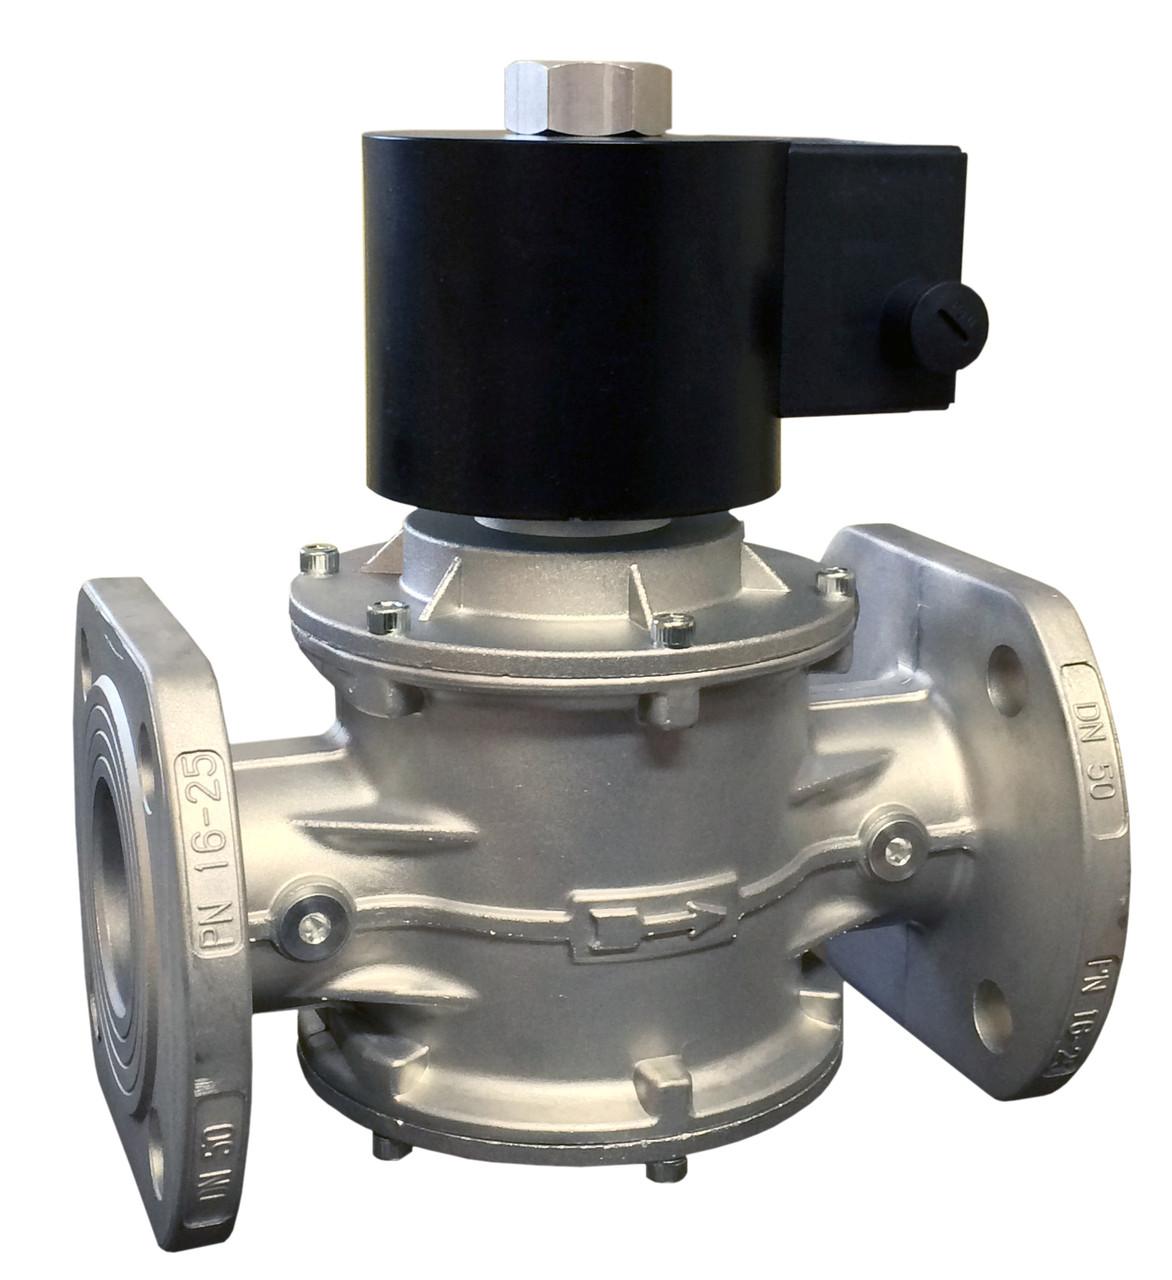 Электромагнитный клапан EV-6, DN32, P=6 bar (MADAS), фланцевый